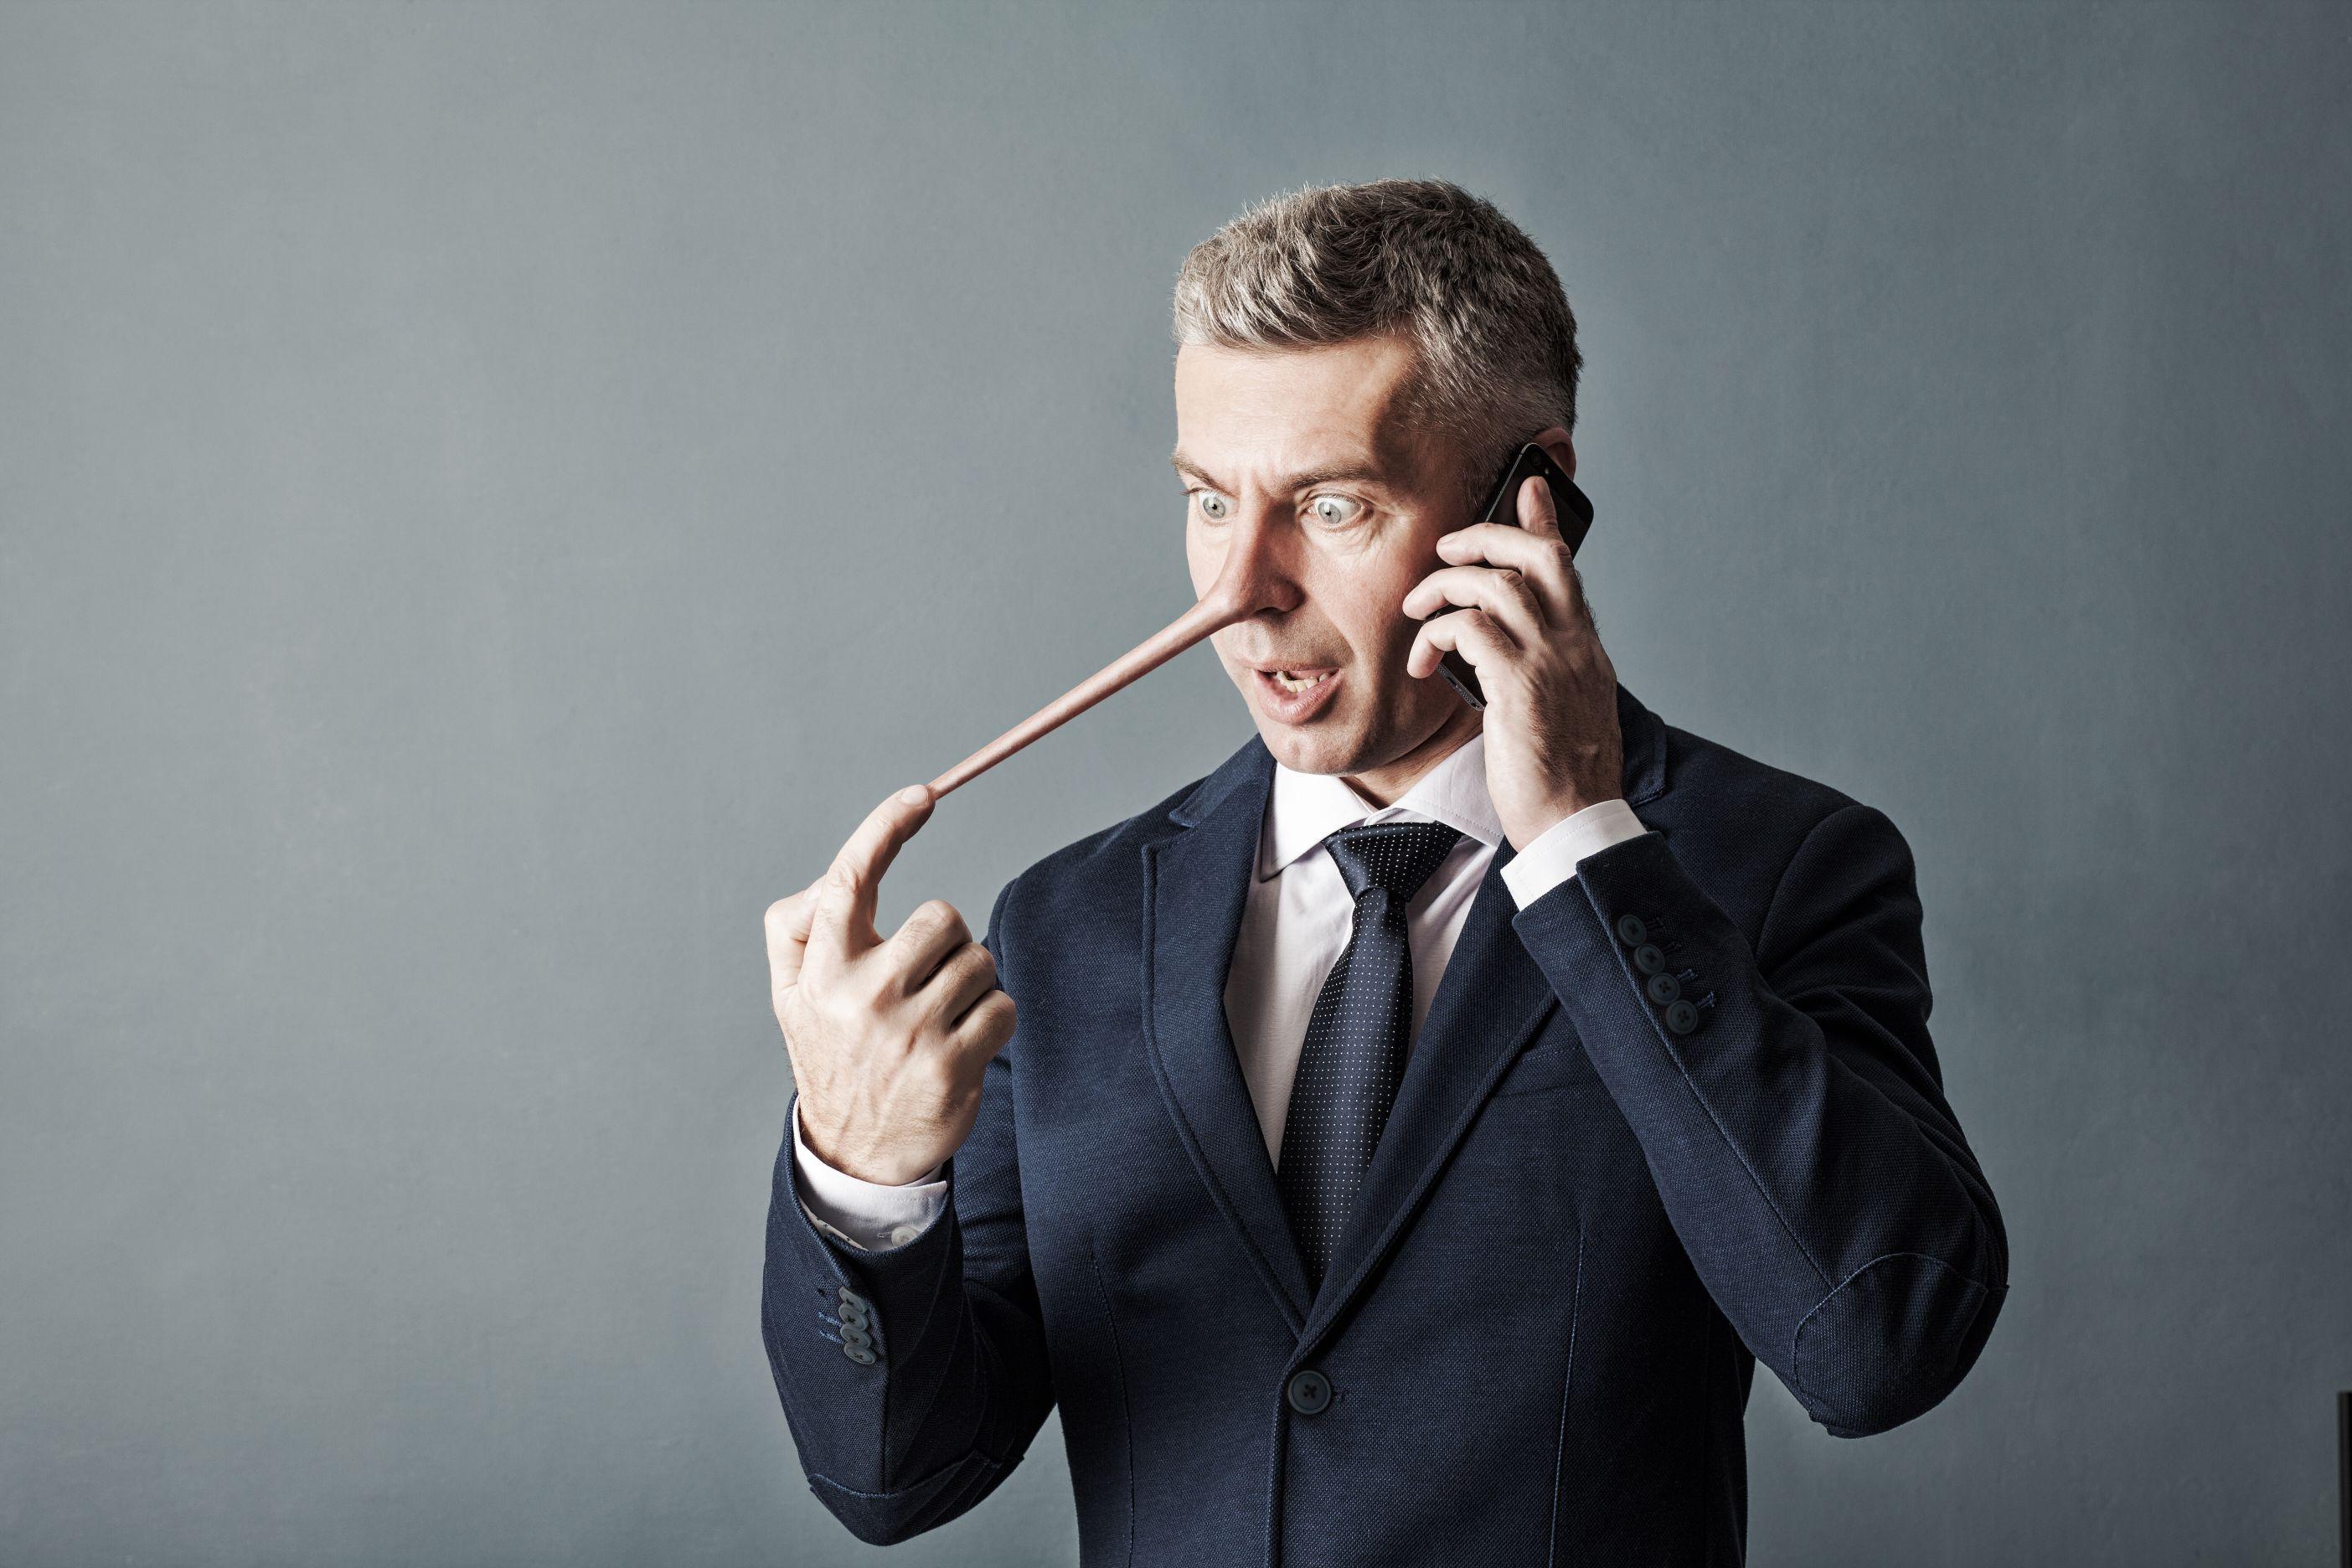 conseiller financier vs vendeur motive